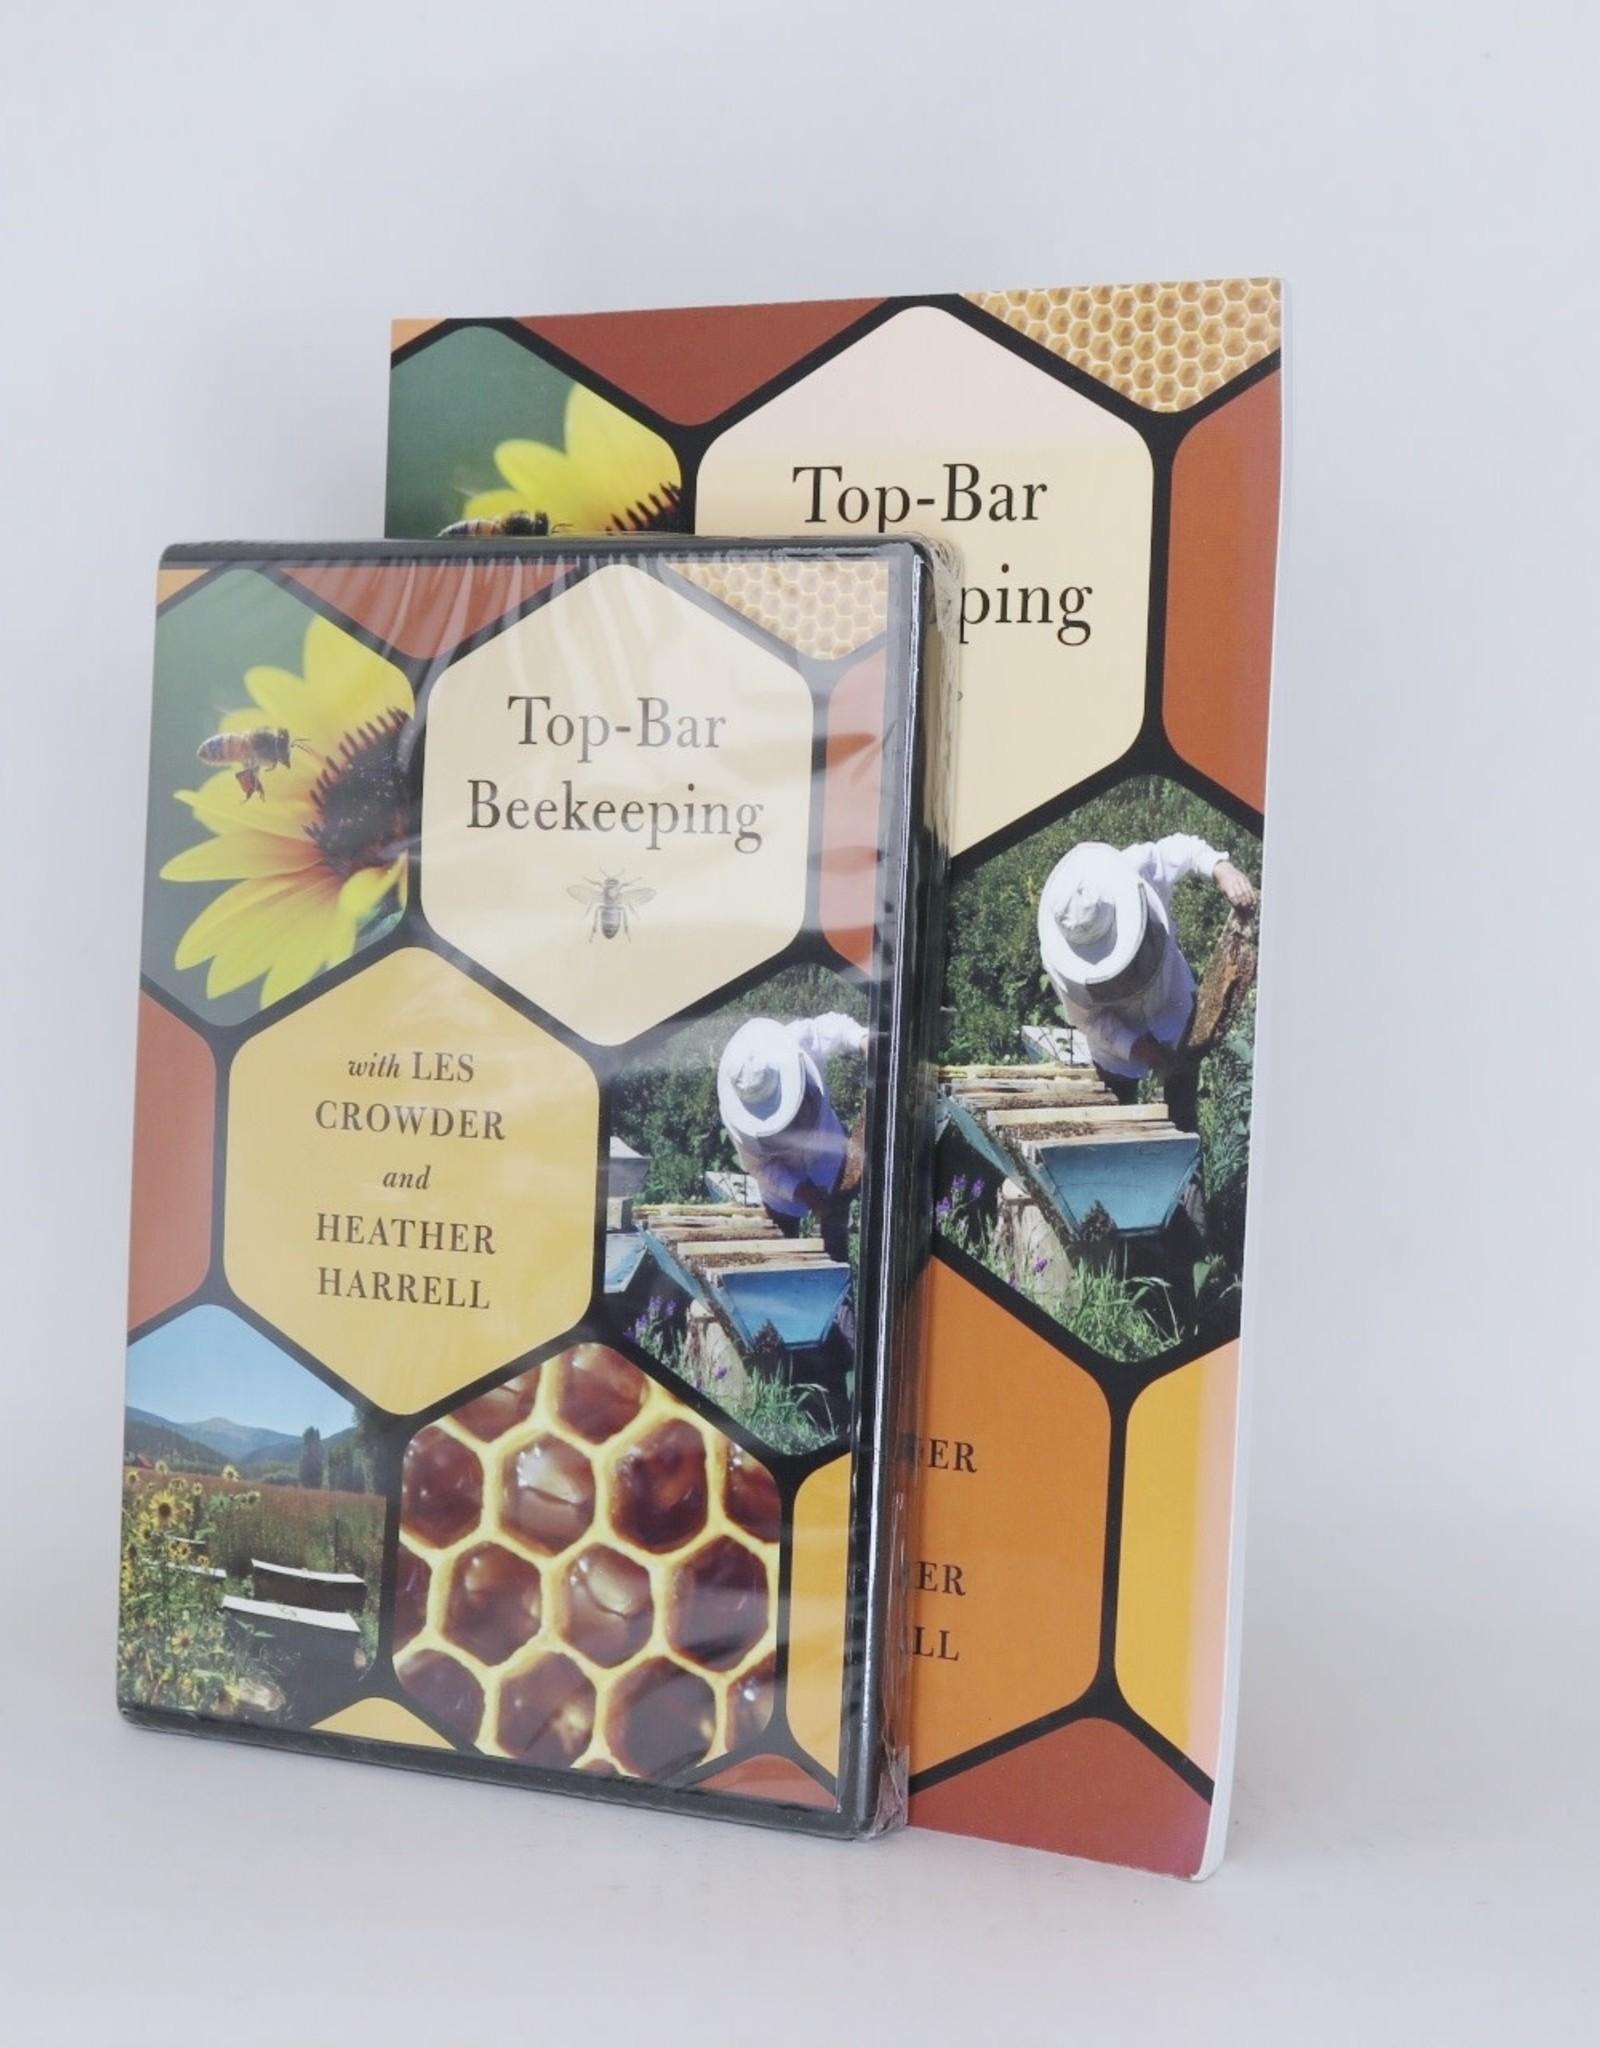 Top-Bar Beekeeping Book & DVD Set